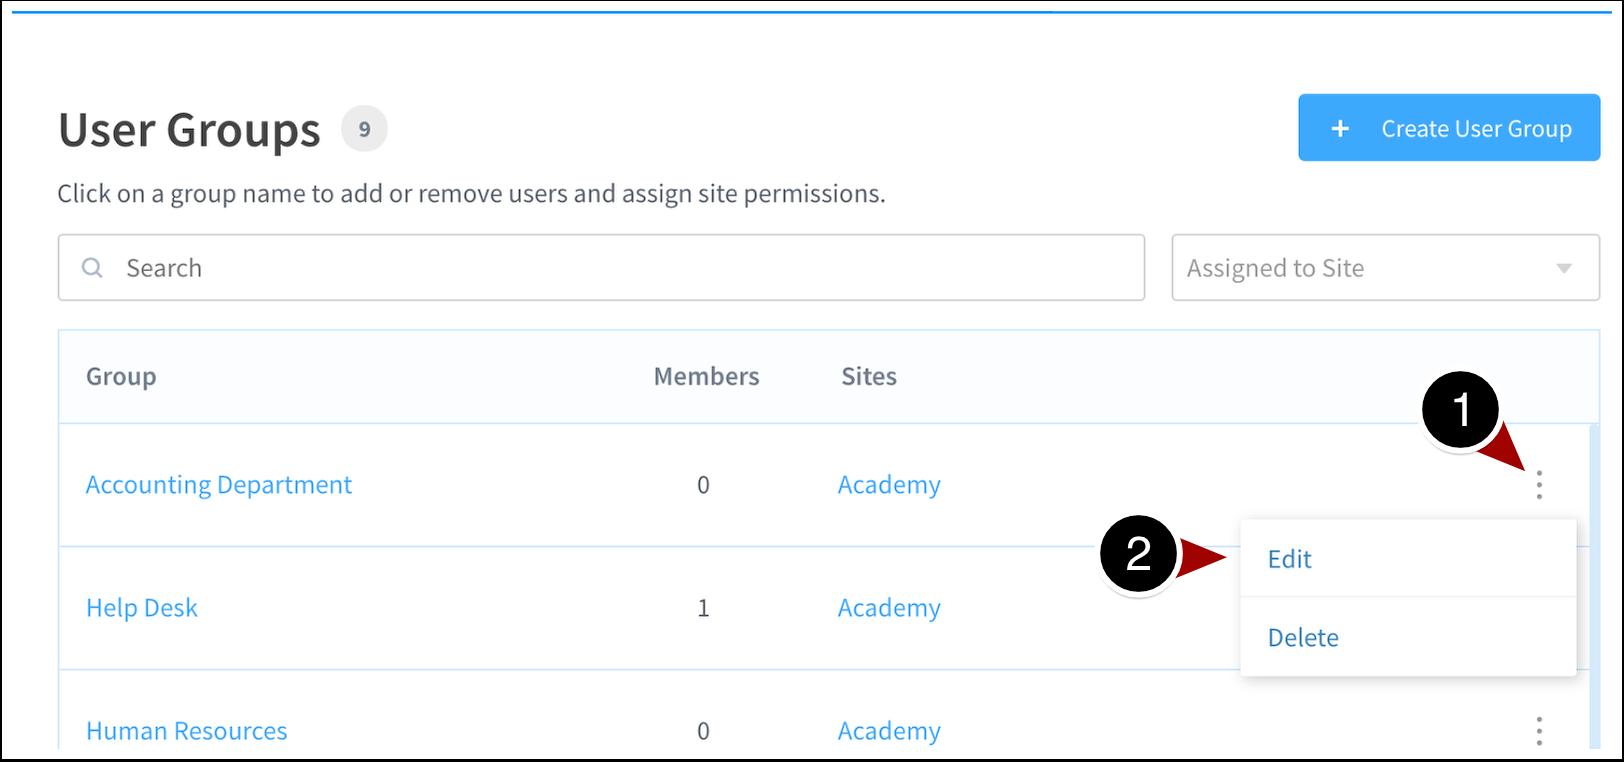 User Groups | ScreenSteps